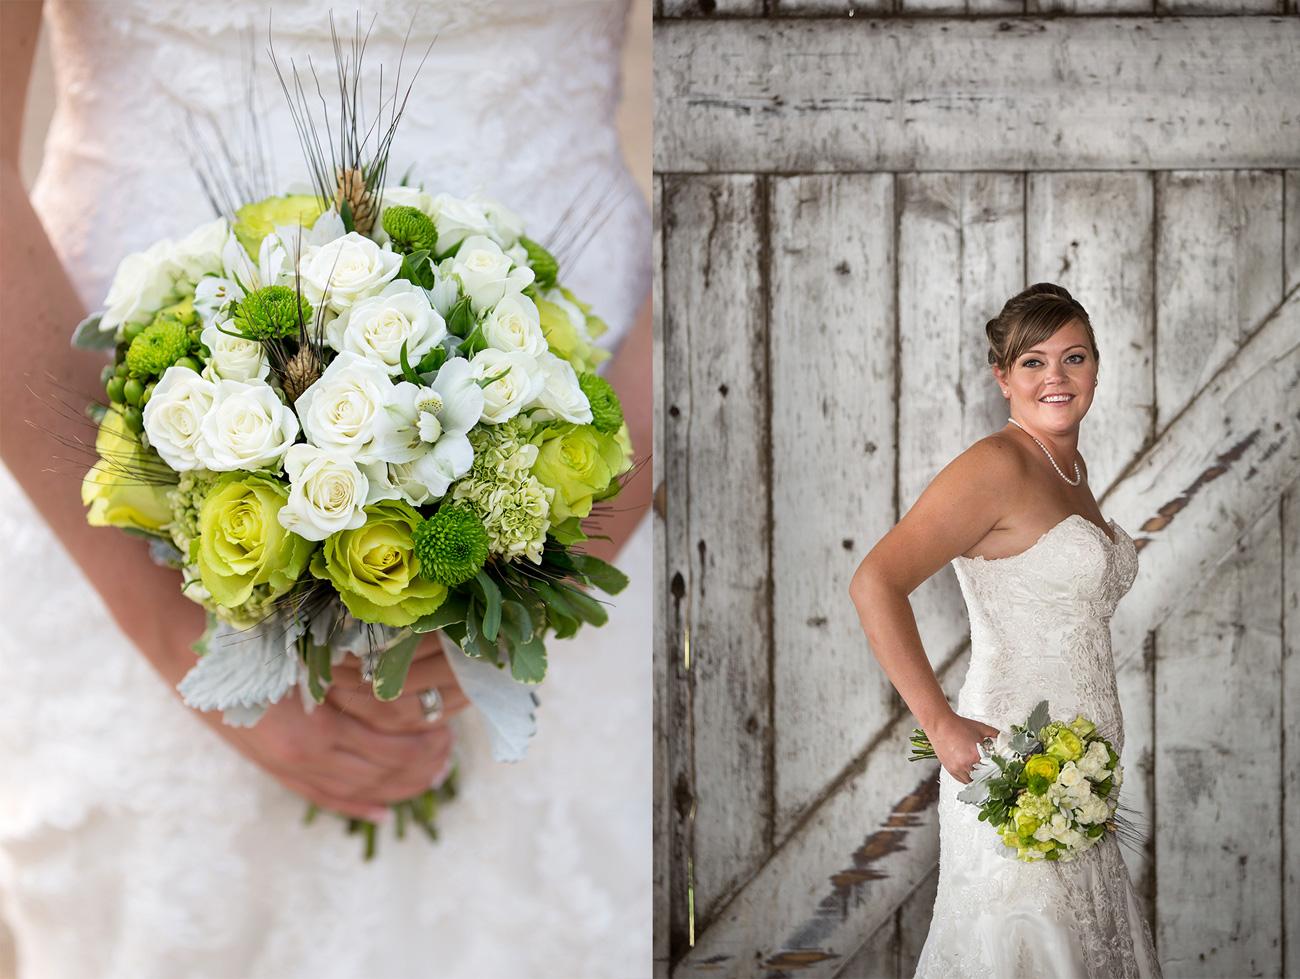 CJ & Jasen - Drumheller Wedding Photography - Calgary Wedding Photographer (39)